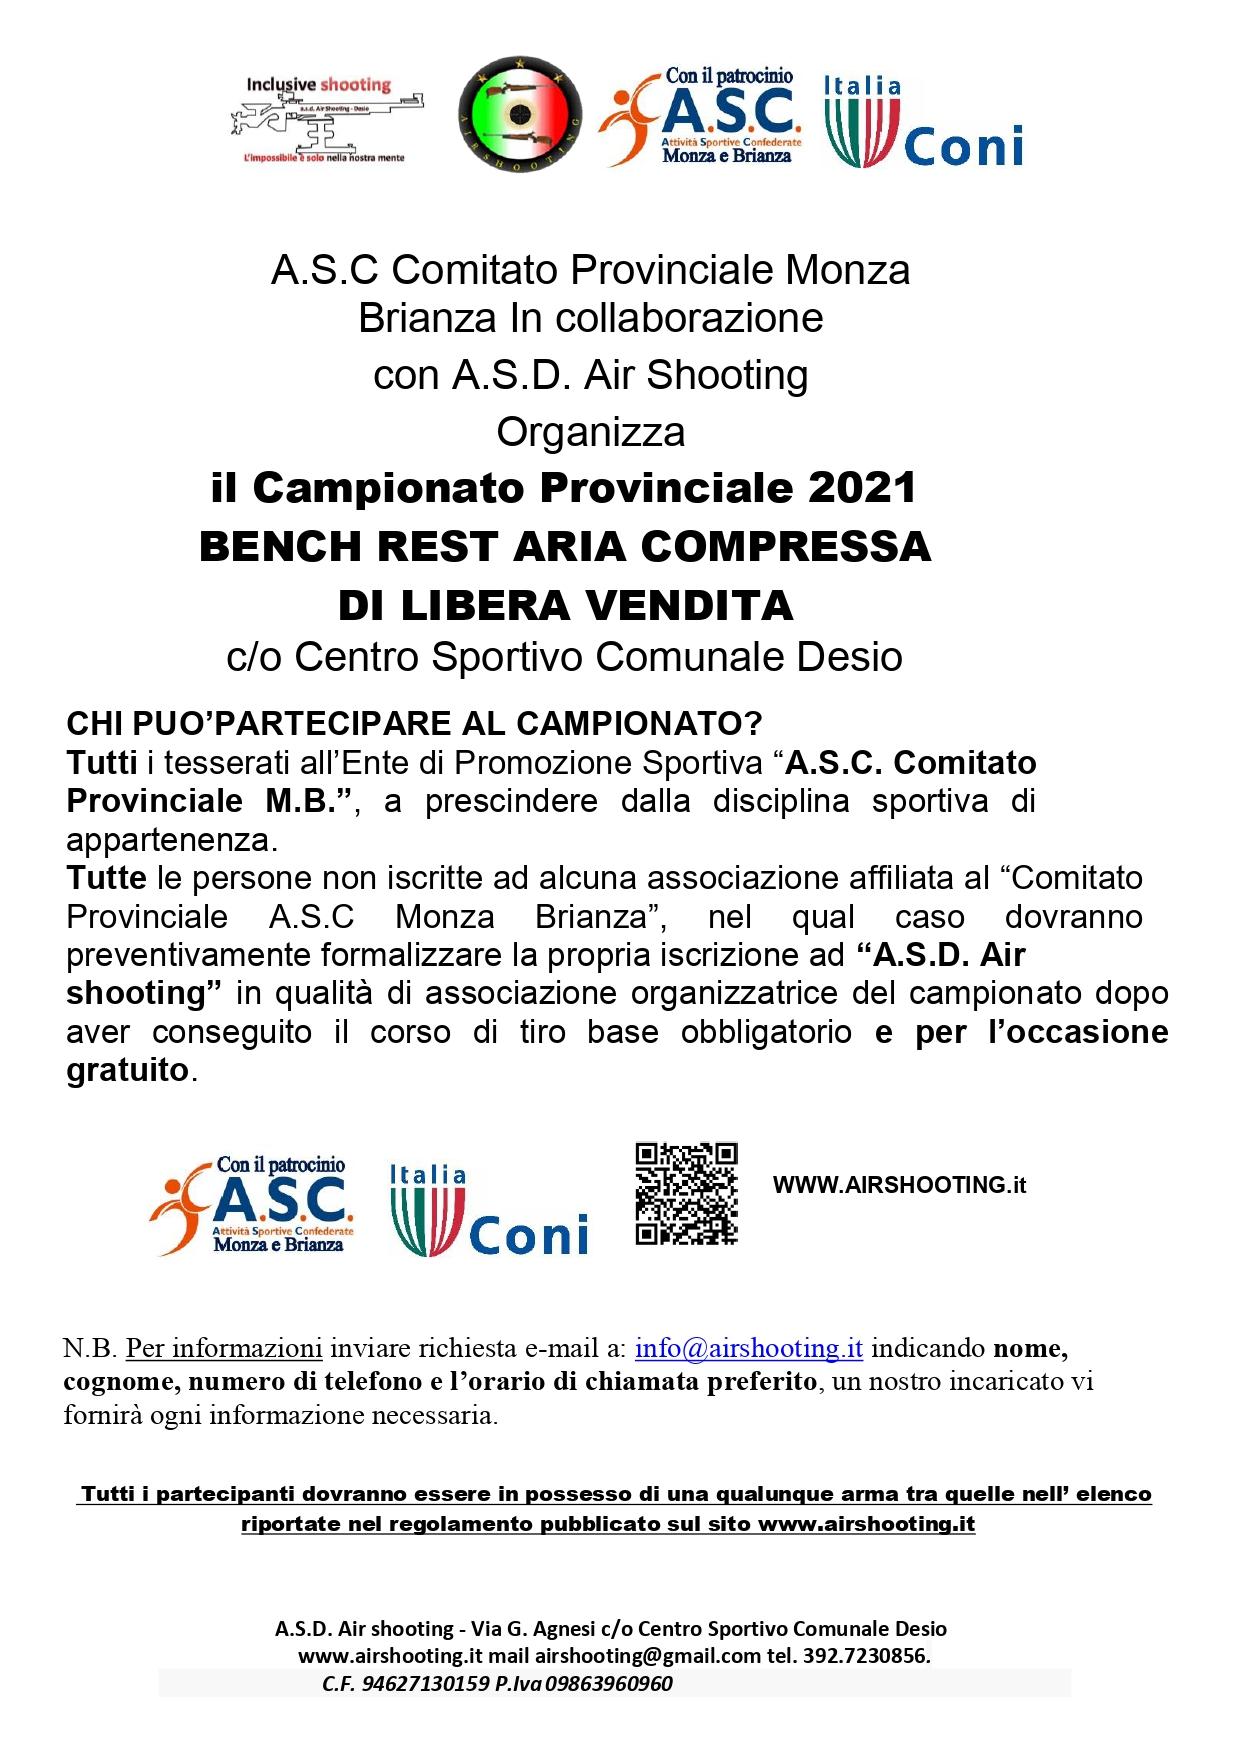 reg campionato 2021 1_page-0001